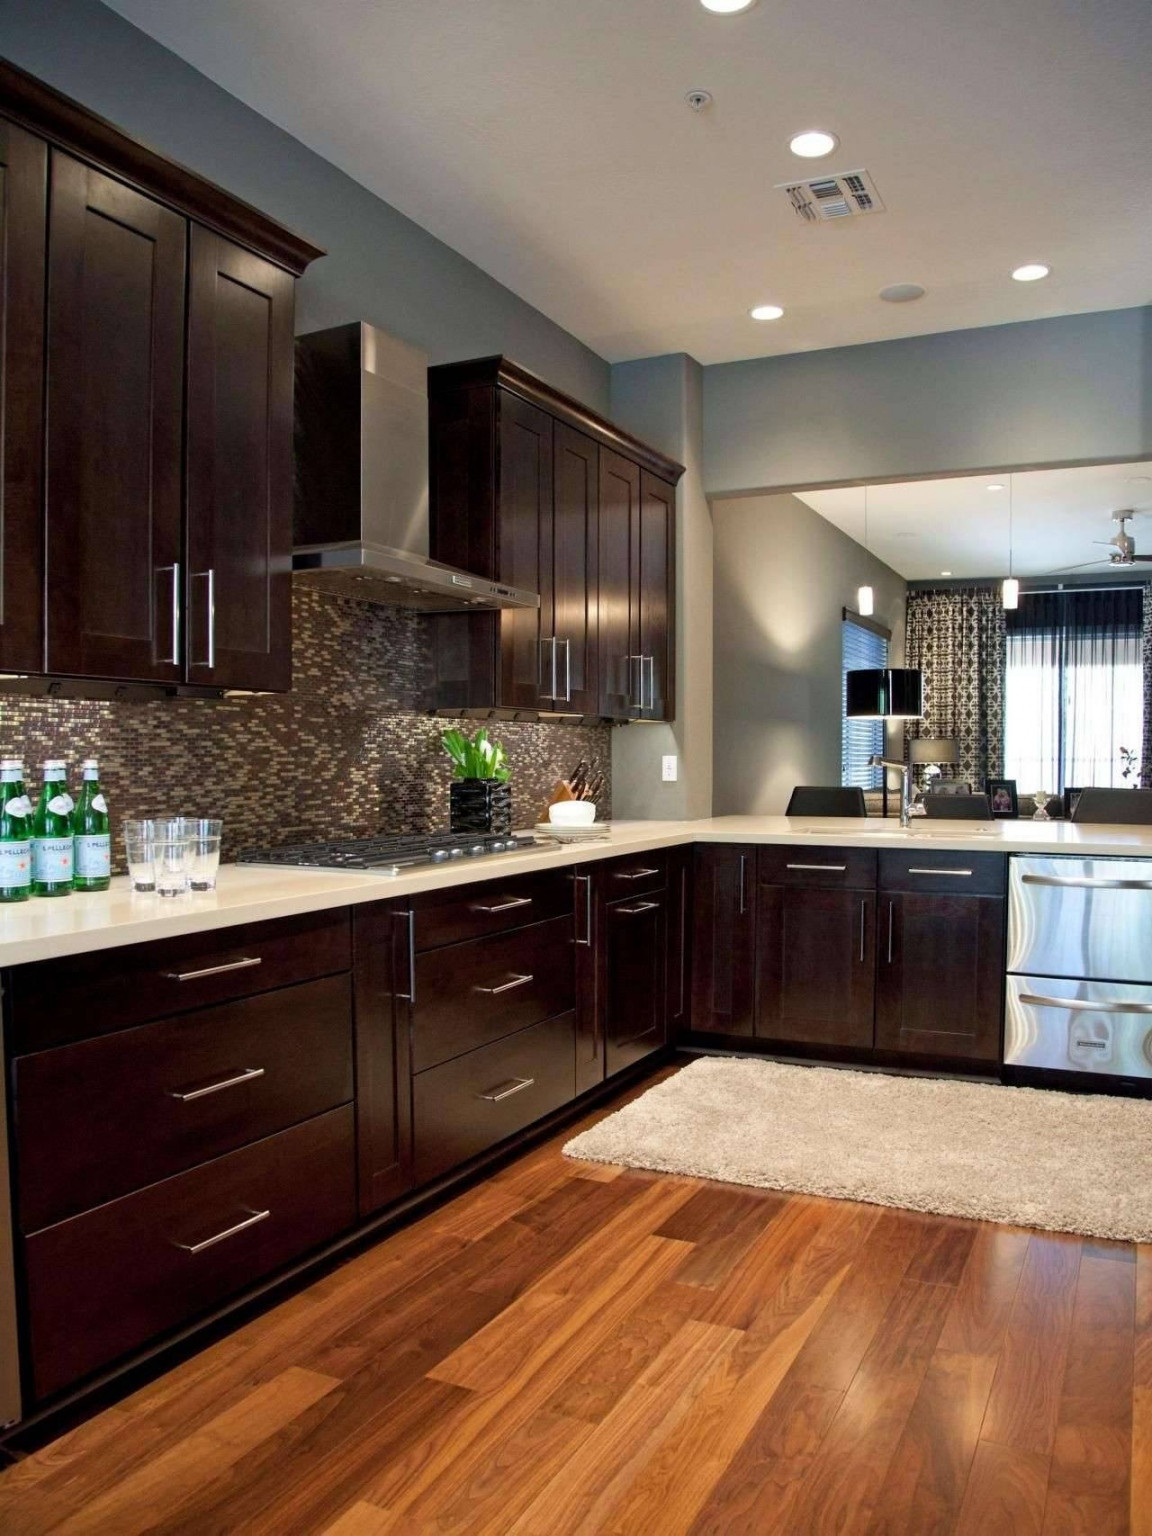 latest hardwood floor trends of kitchen design trends 2018 design haccptemperature intended for latest kitchen flooring trends lovely dining room designs stunning